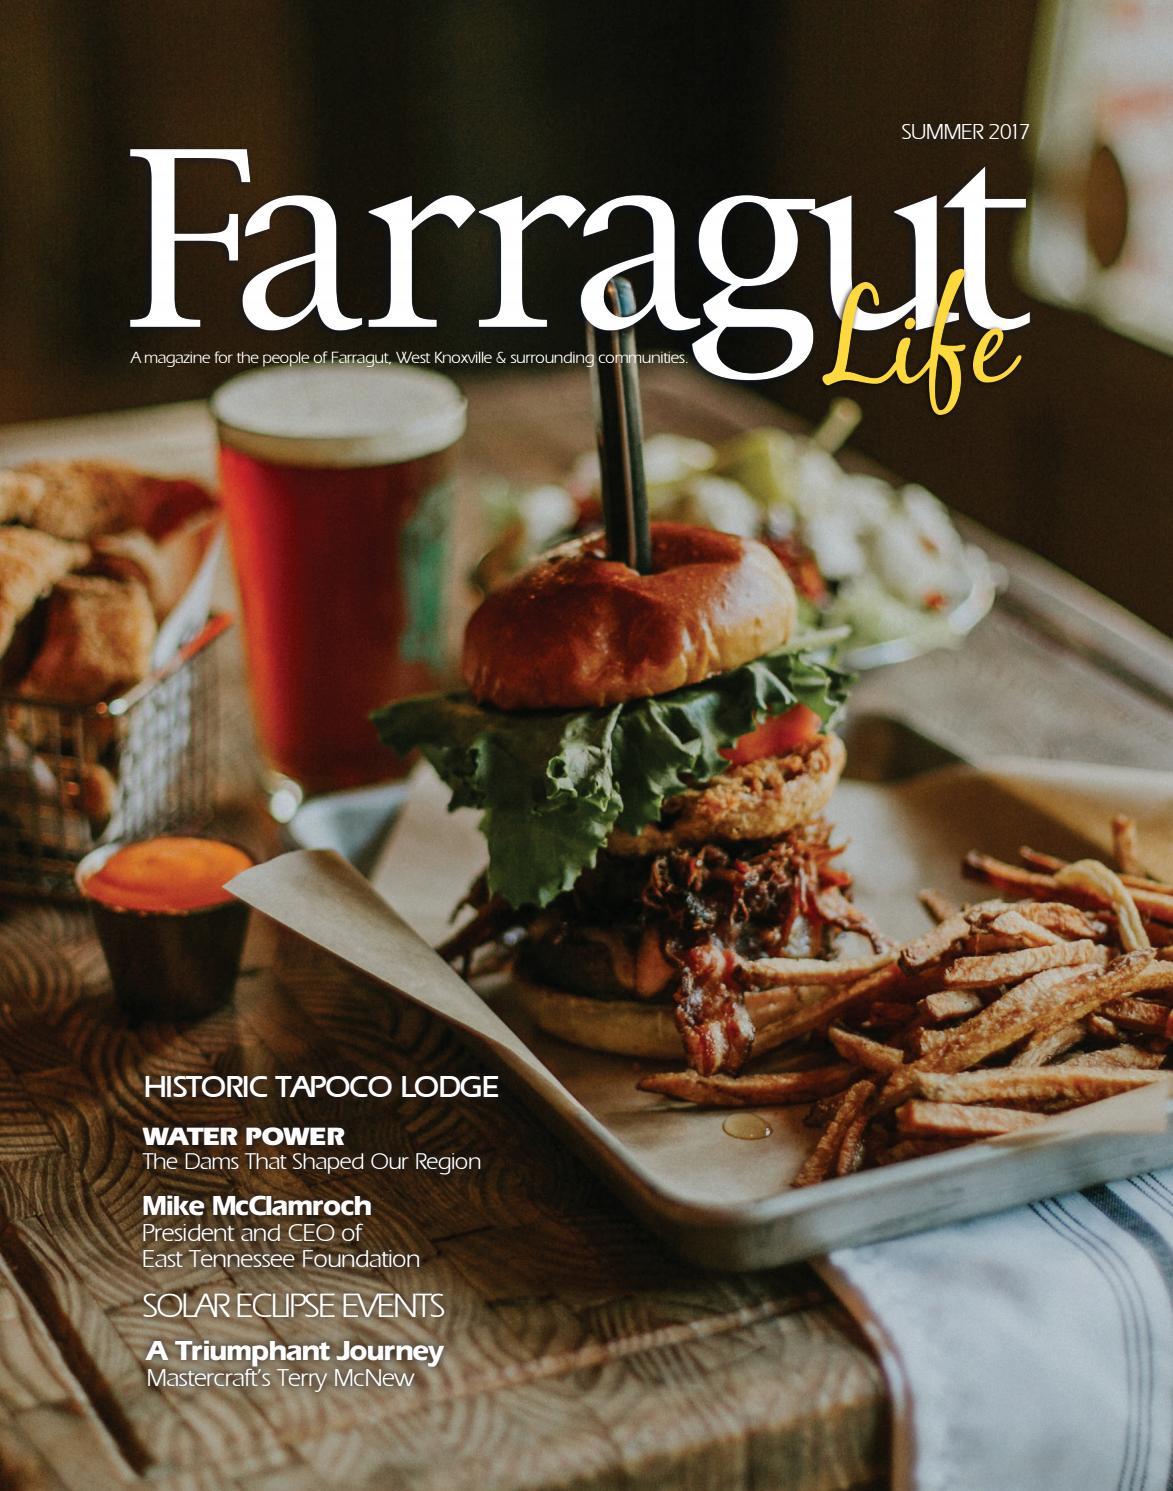 Farragut Life Summer 2017 by Bingham Group - issuu